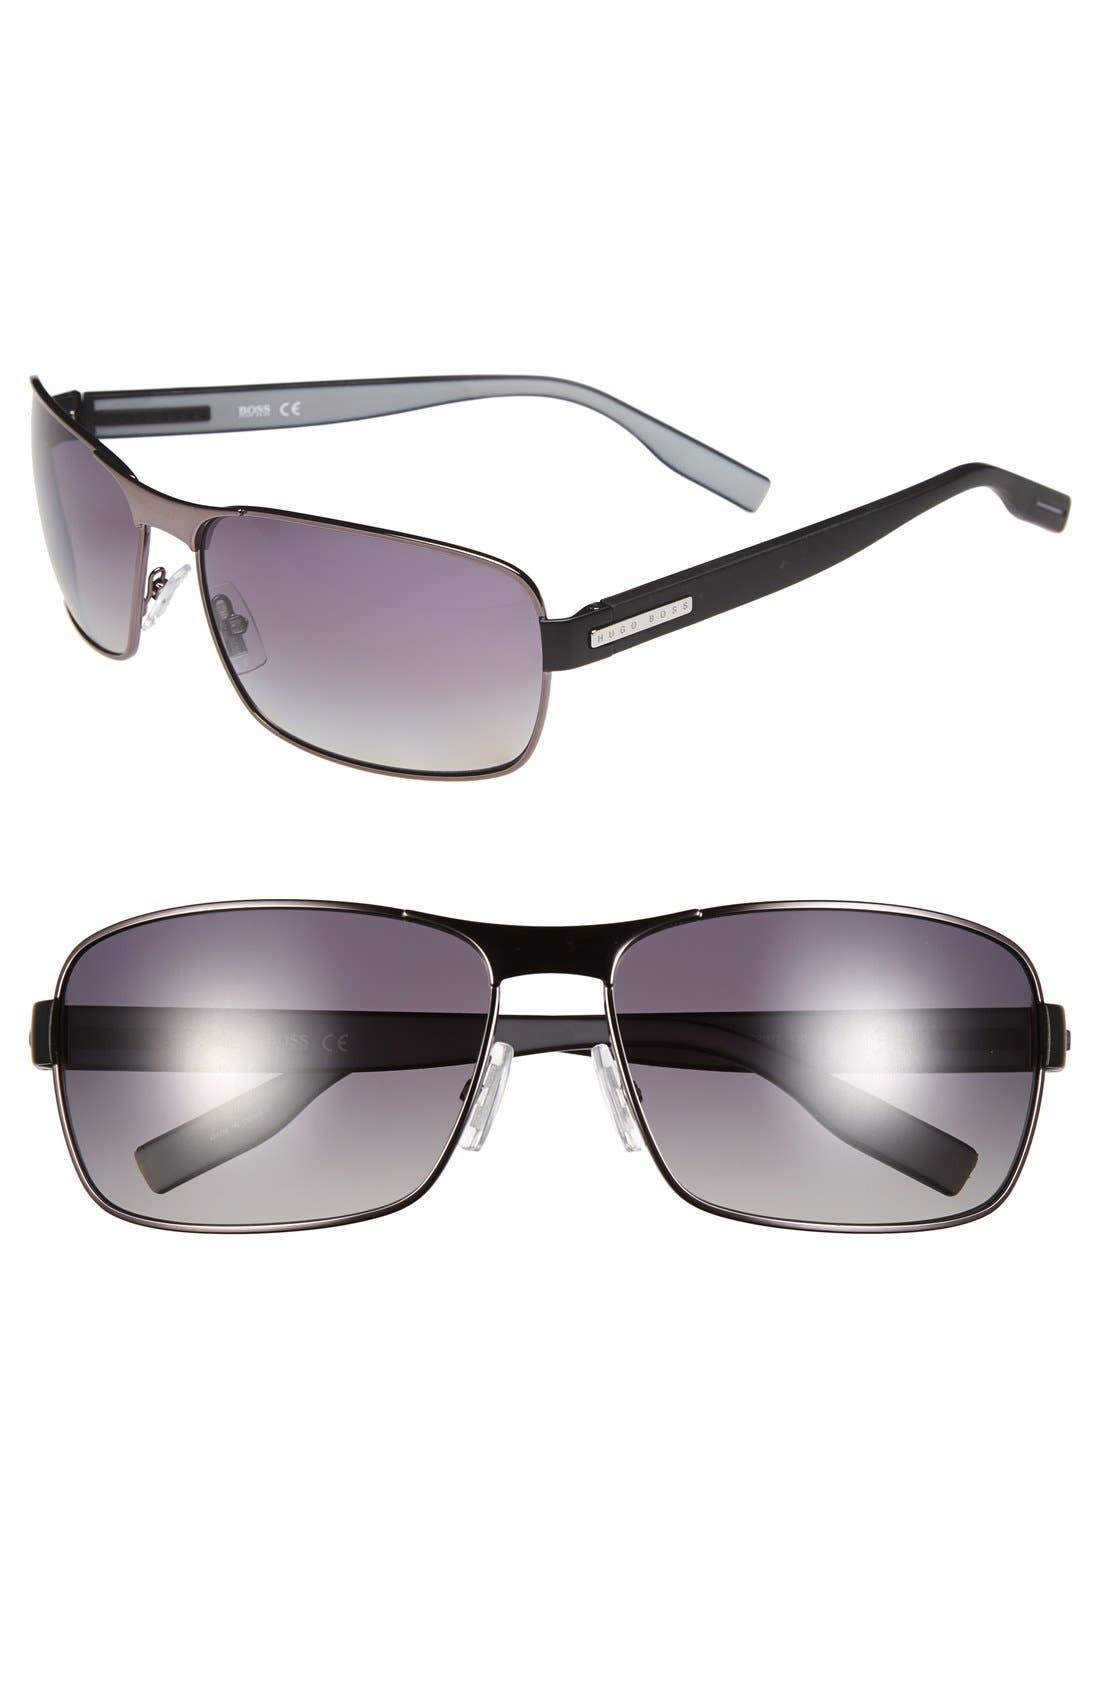 62mm Polarized Sunglasses,                         Main,                         color, Dark Ruthenuim